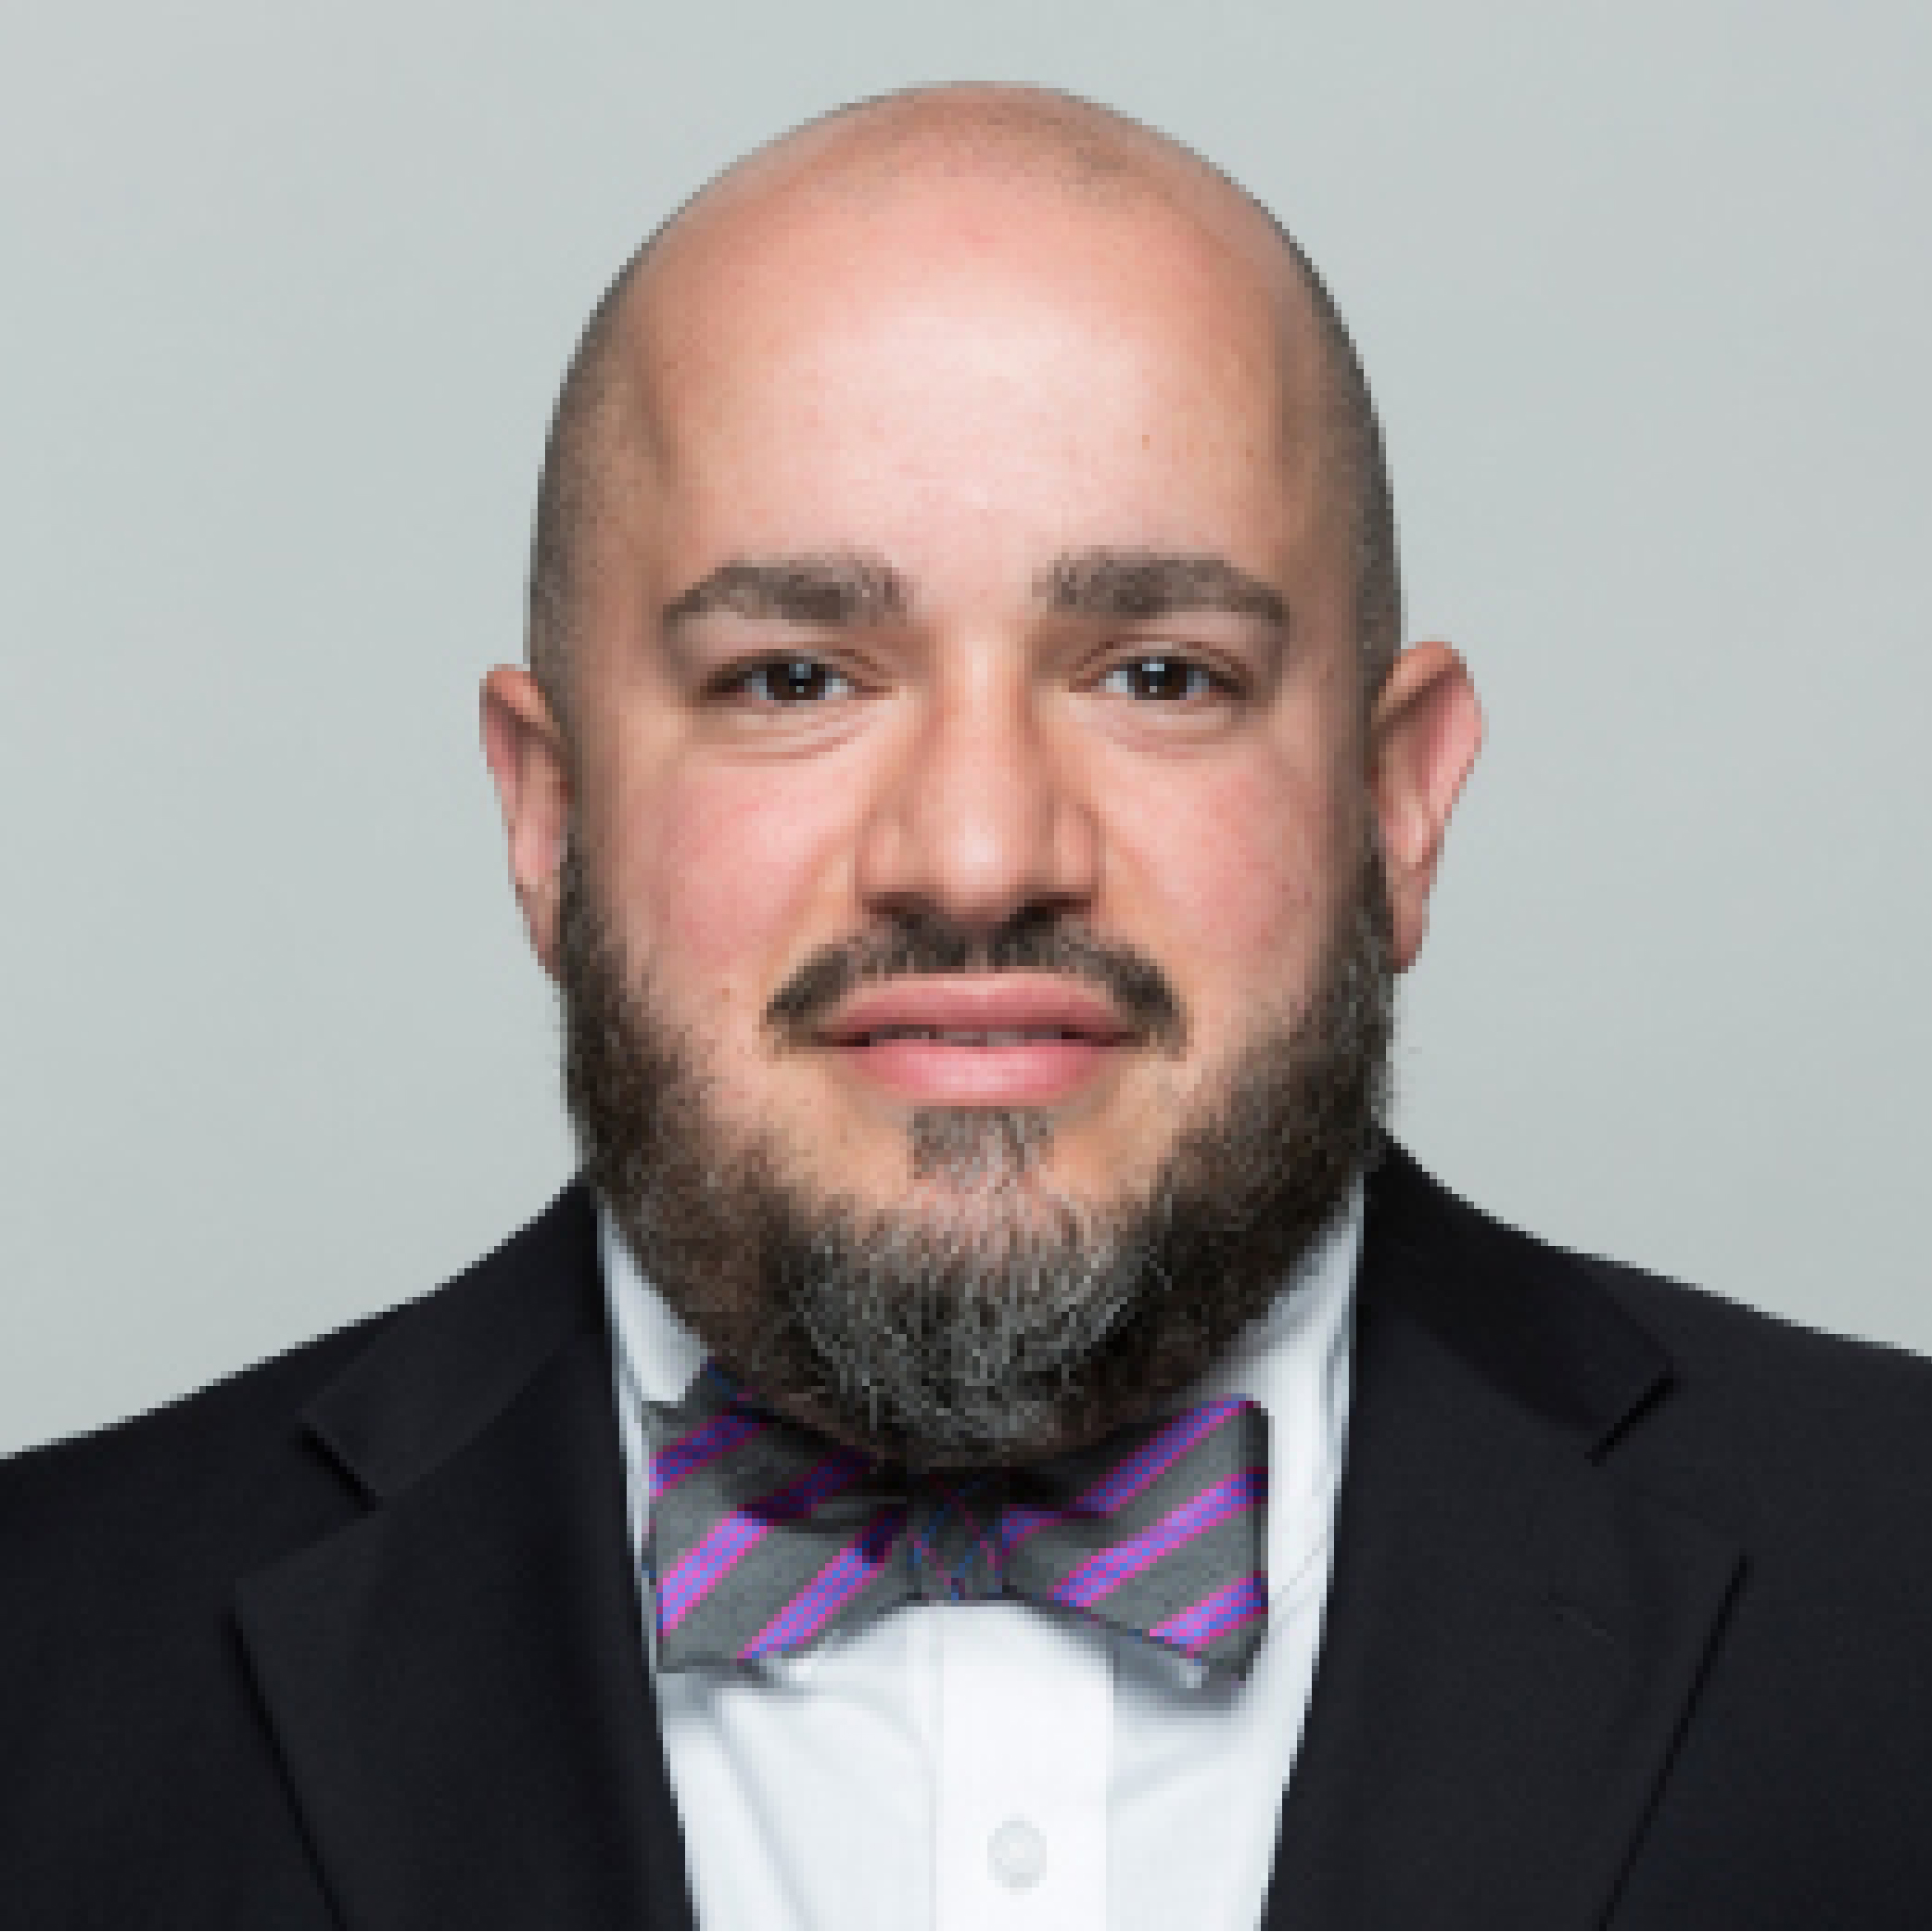 portrait of José Francisco Morales Torres